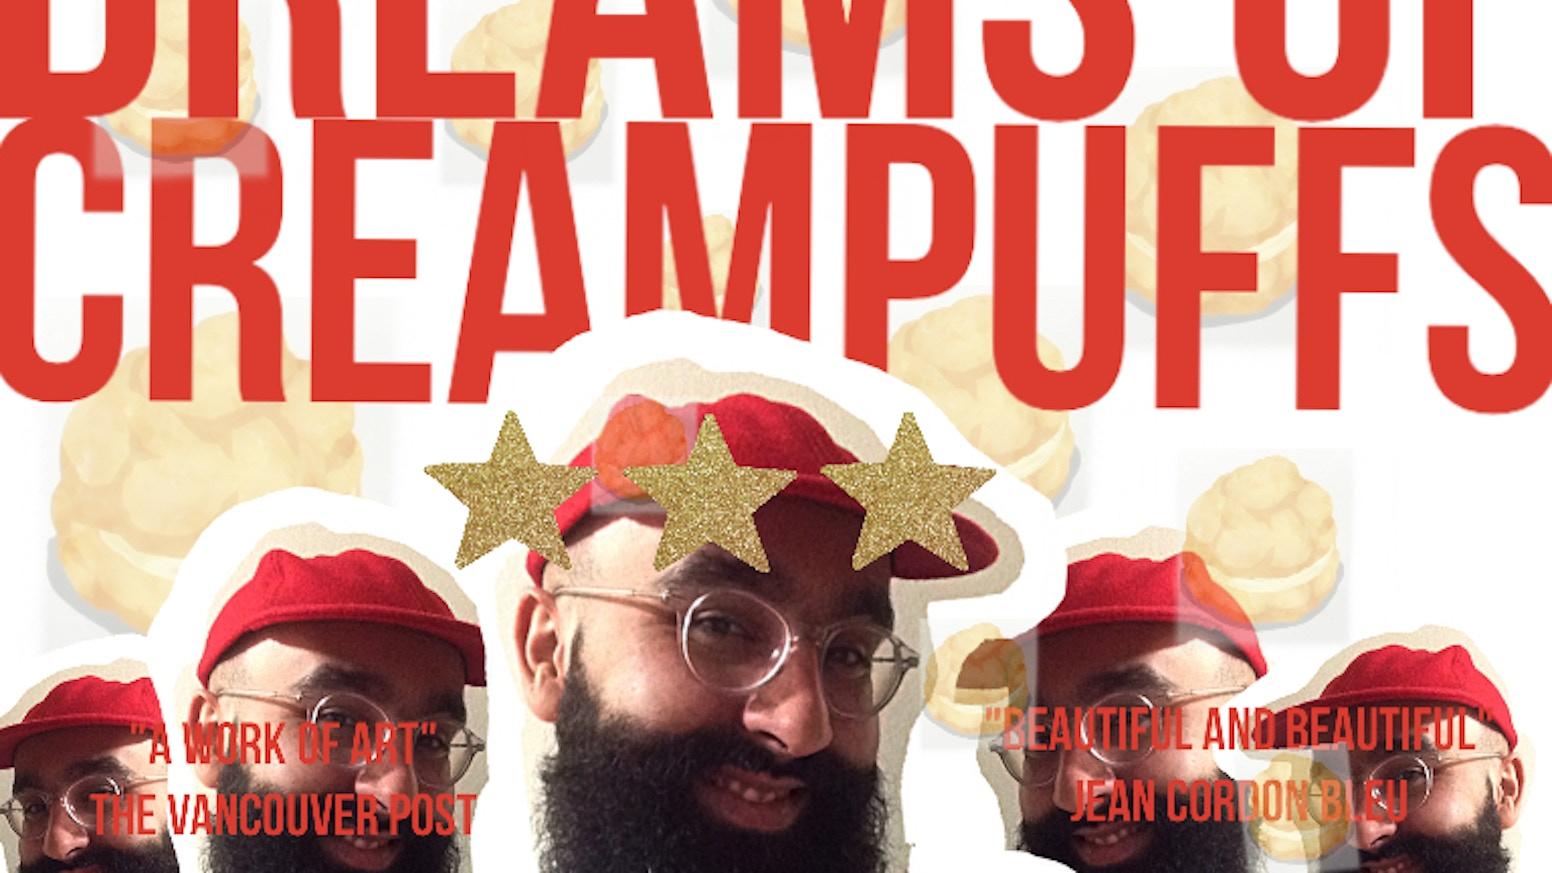 Sweet boy dreams of cream puffs by chams — Kickstarter